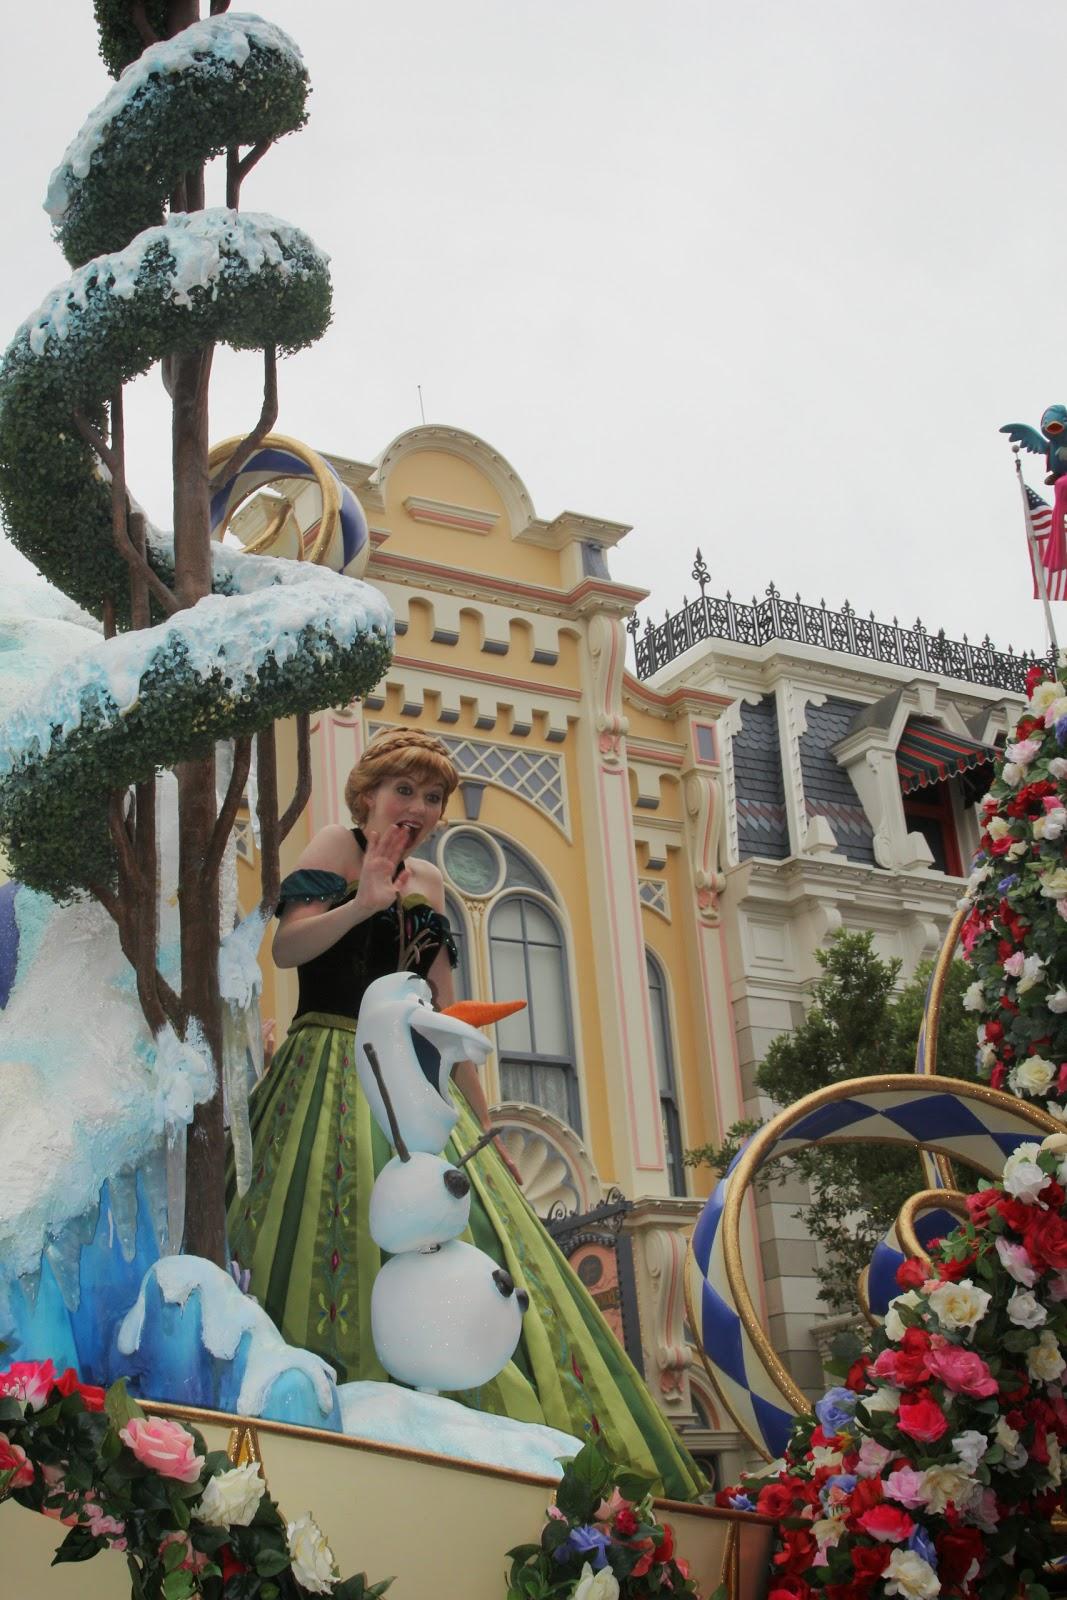 Princess Anna and Olaf